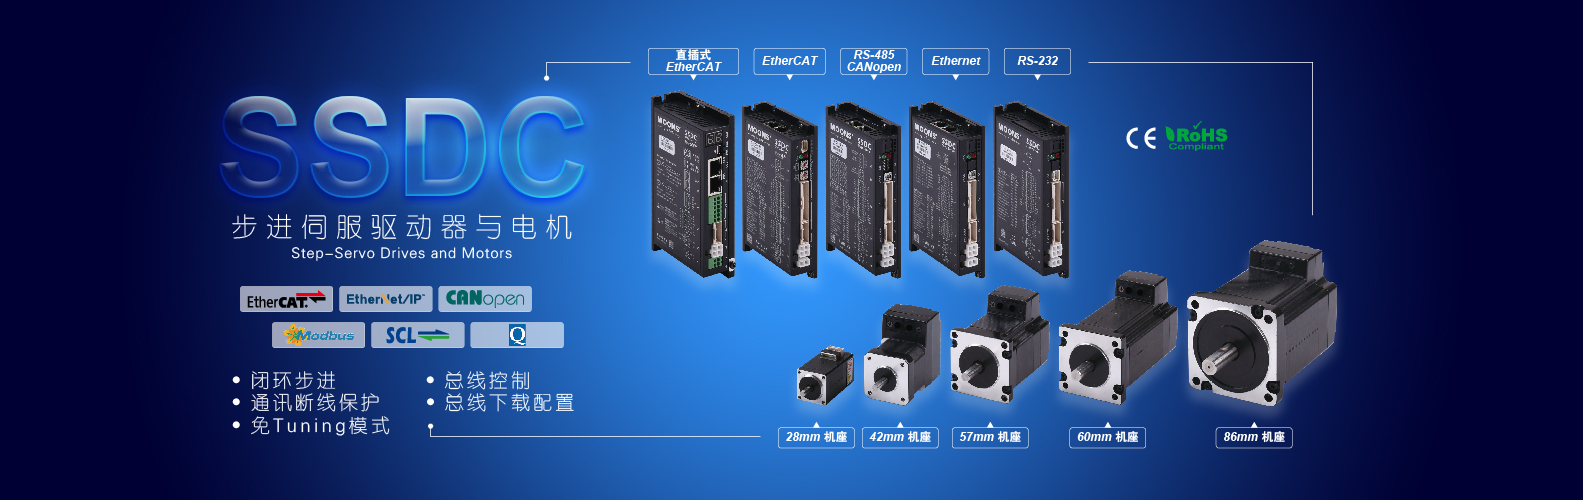 SSDC系列步进伺服驱动器与电机